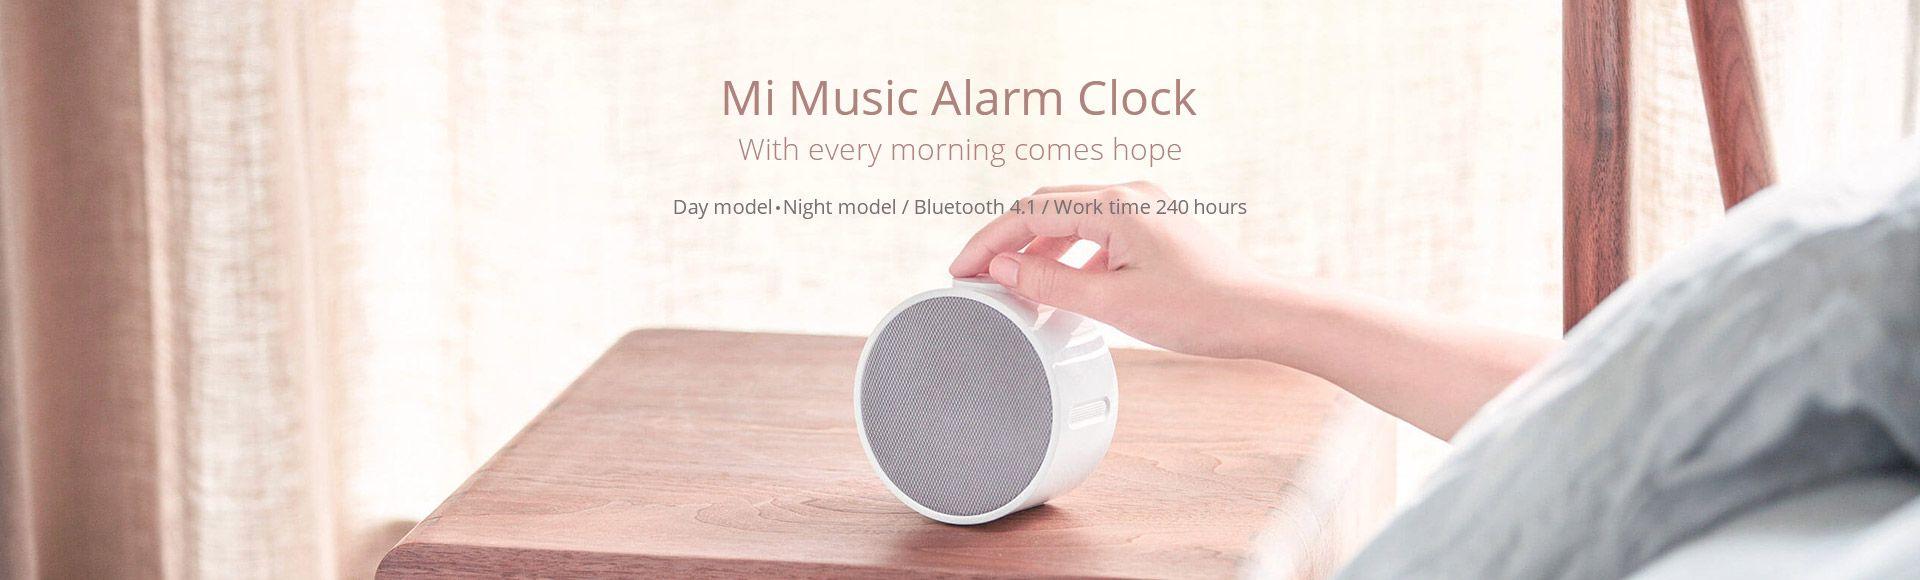 Xiaomi Mi Music Alarm Clock - Clock with speaker,Bluetooth 4.1,Day model/Night model